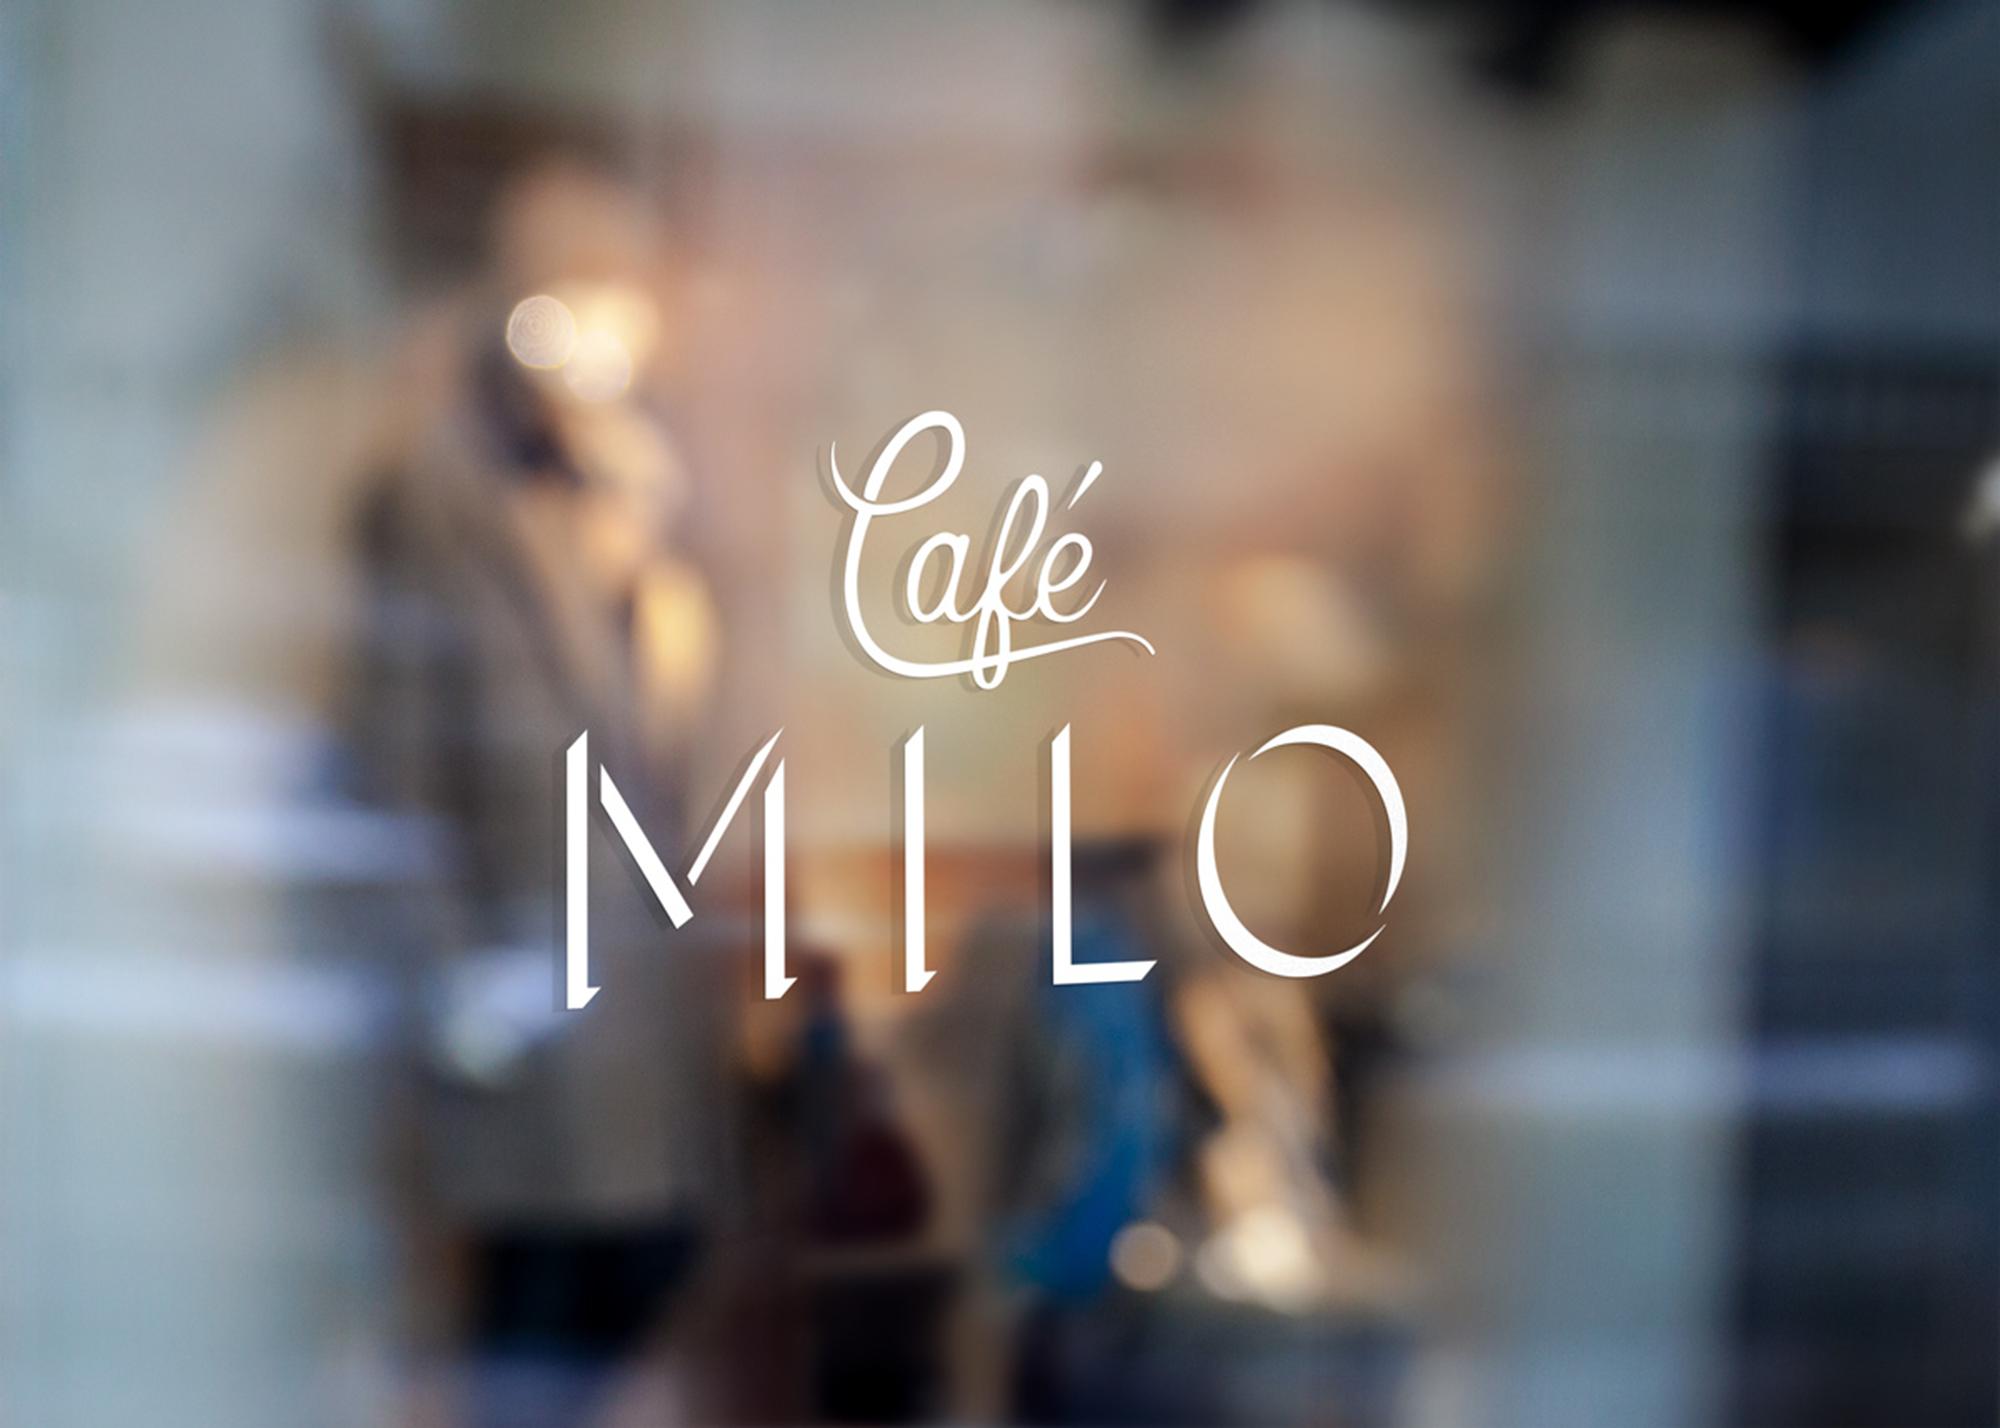 sara-thom-window-cafemilo.jpg